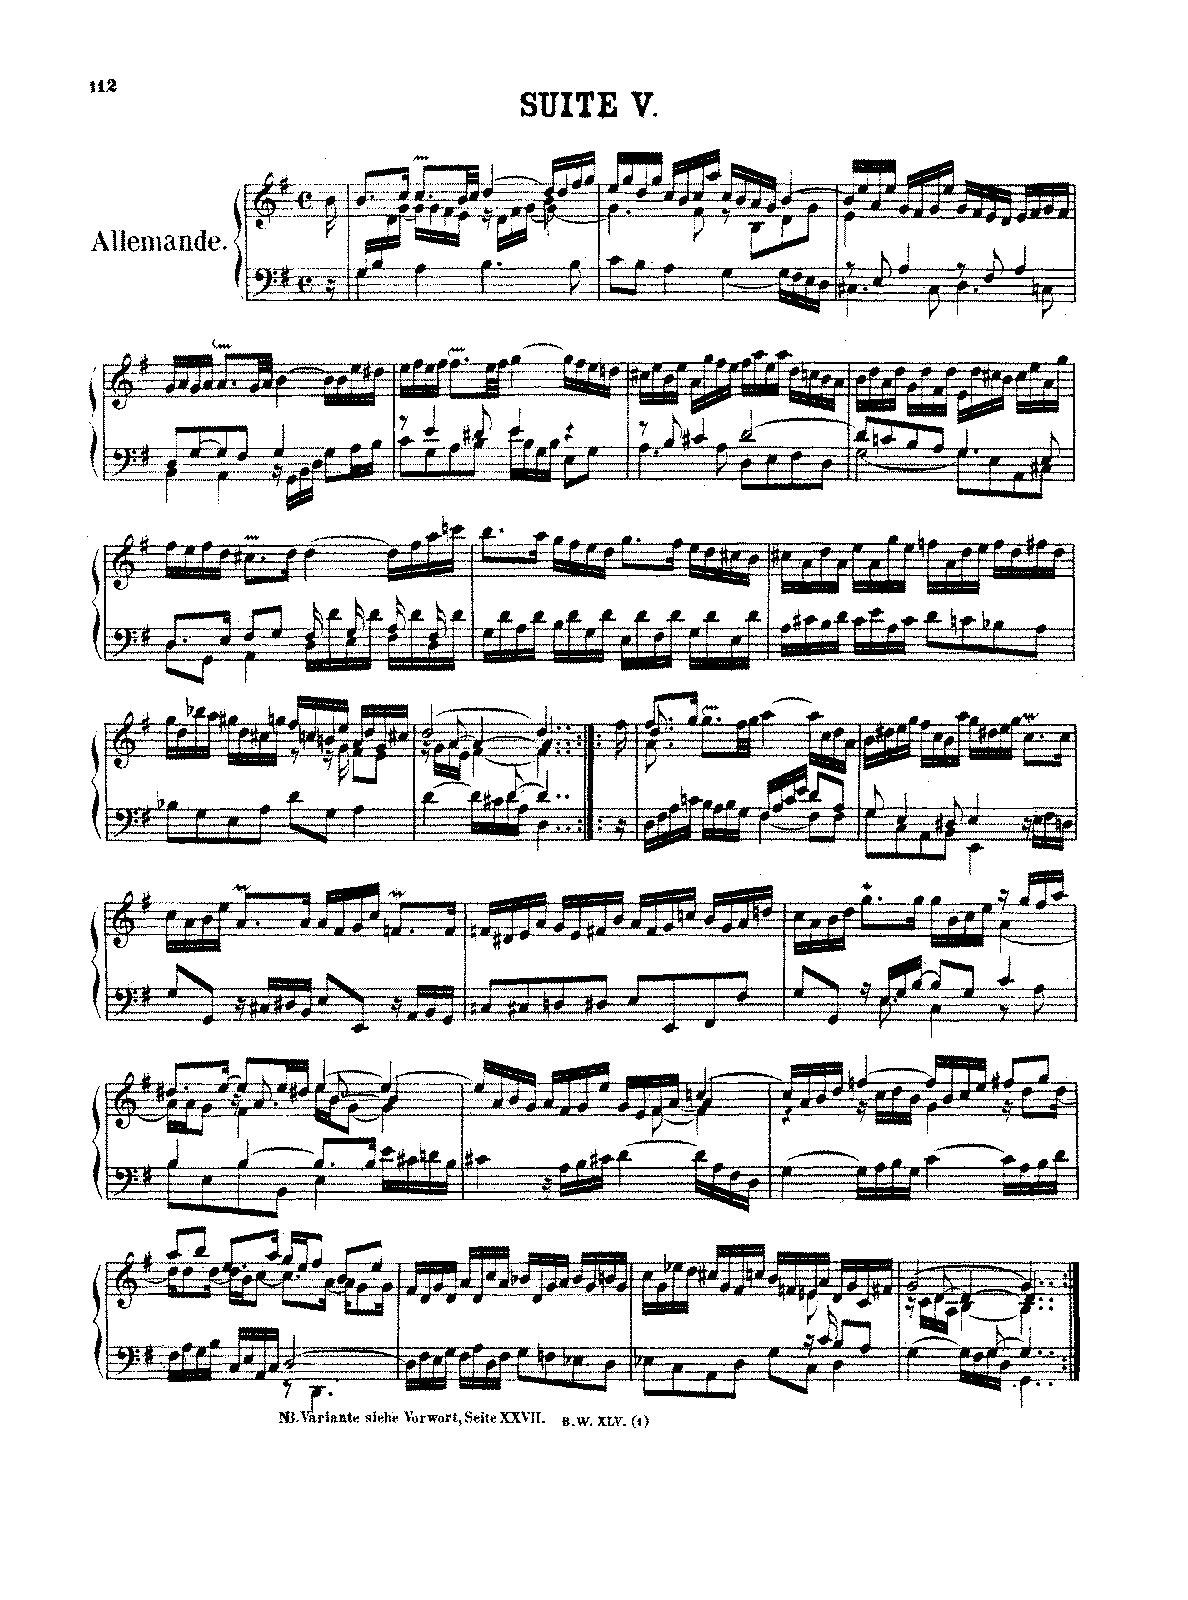 Johann Sebastian Bach Bach - Carlo Curley - The Emperor's Fanfare